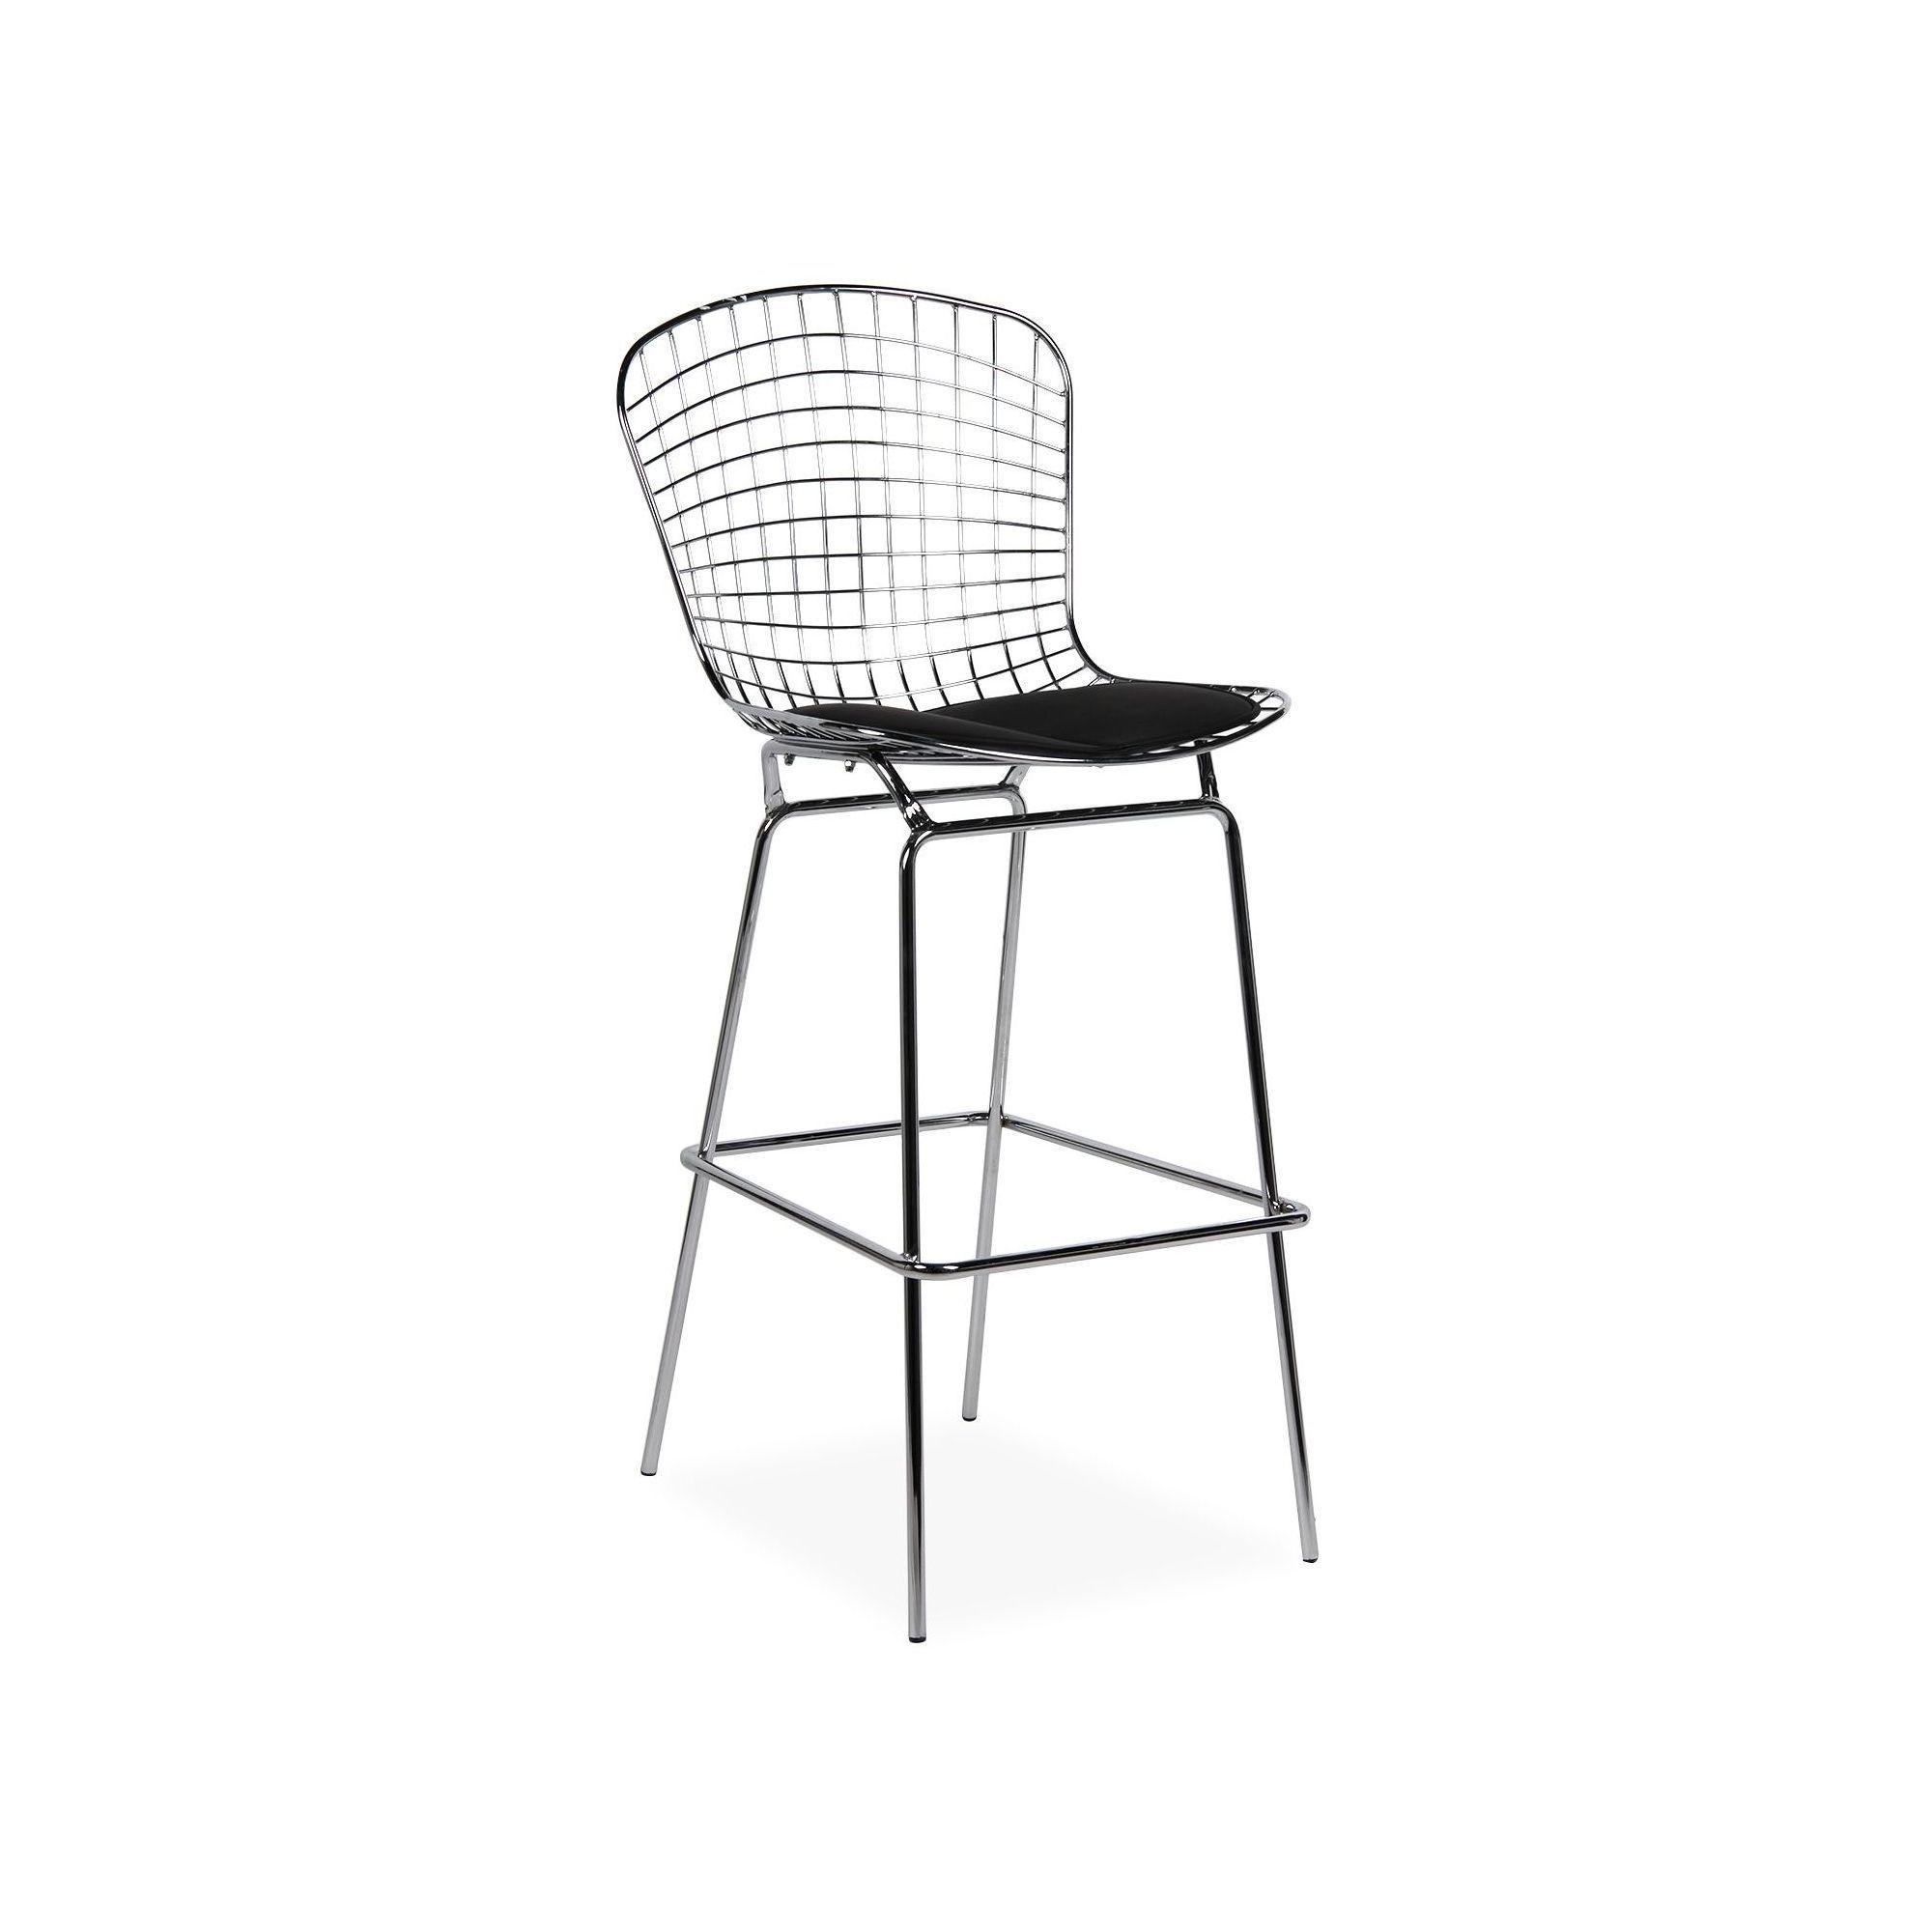 Rocking Chair Scandinave Avon Chaise Design Chaise A Bascule Chaise Fauteuil